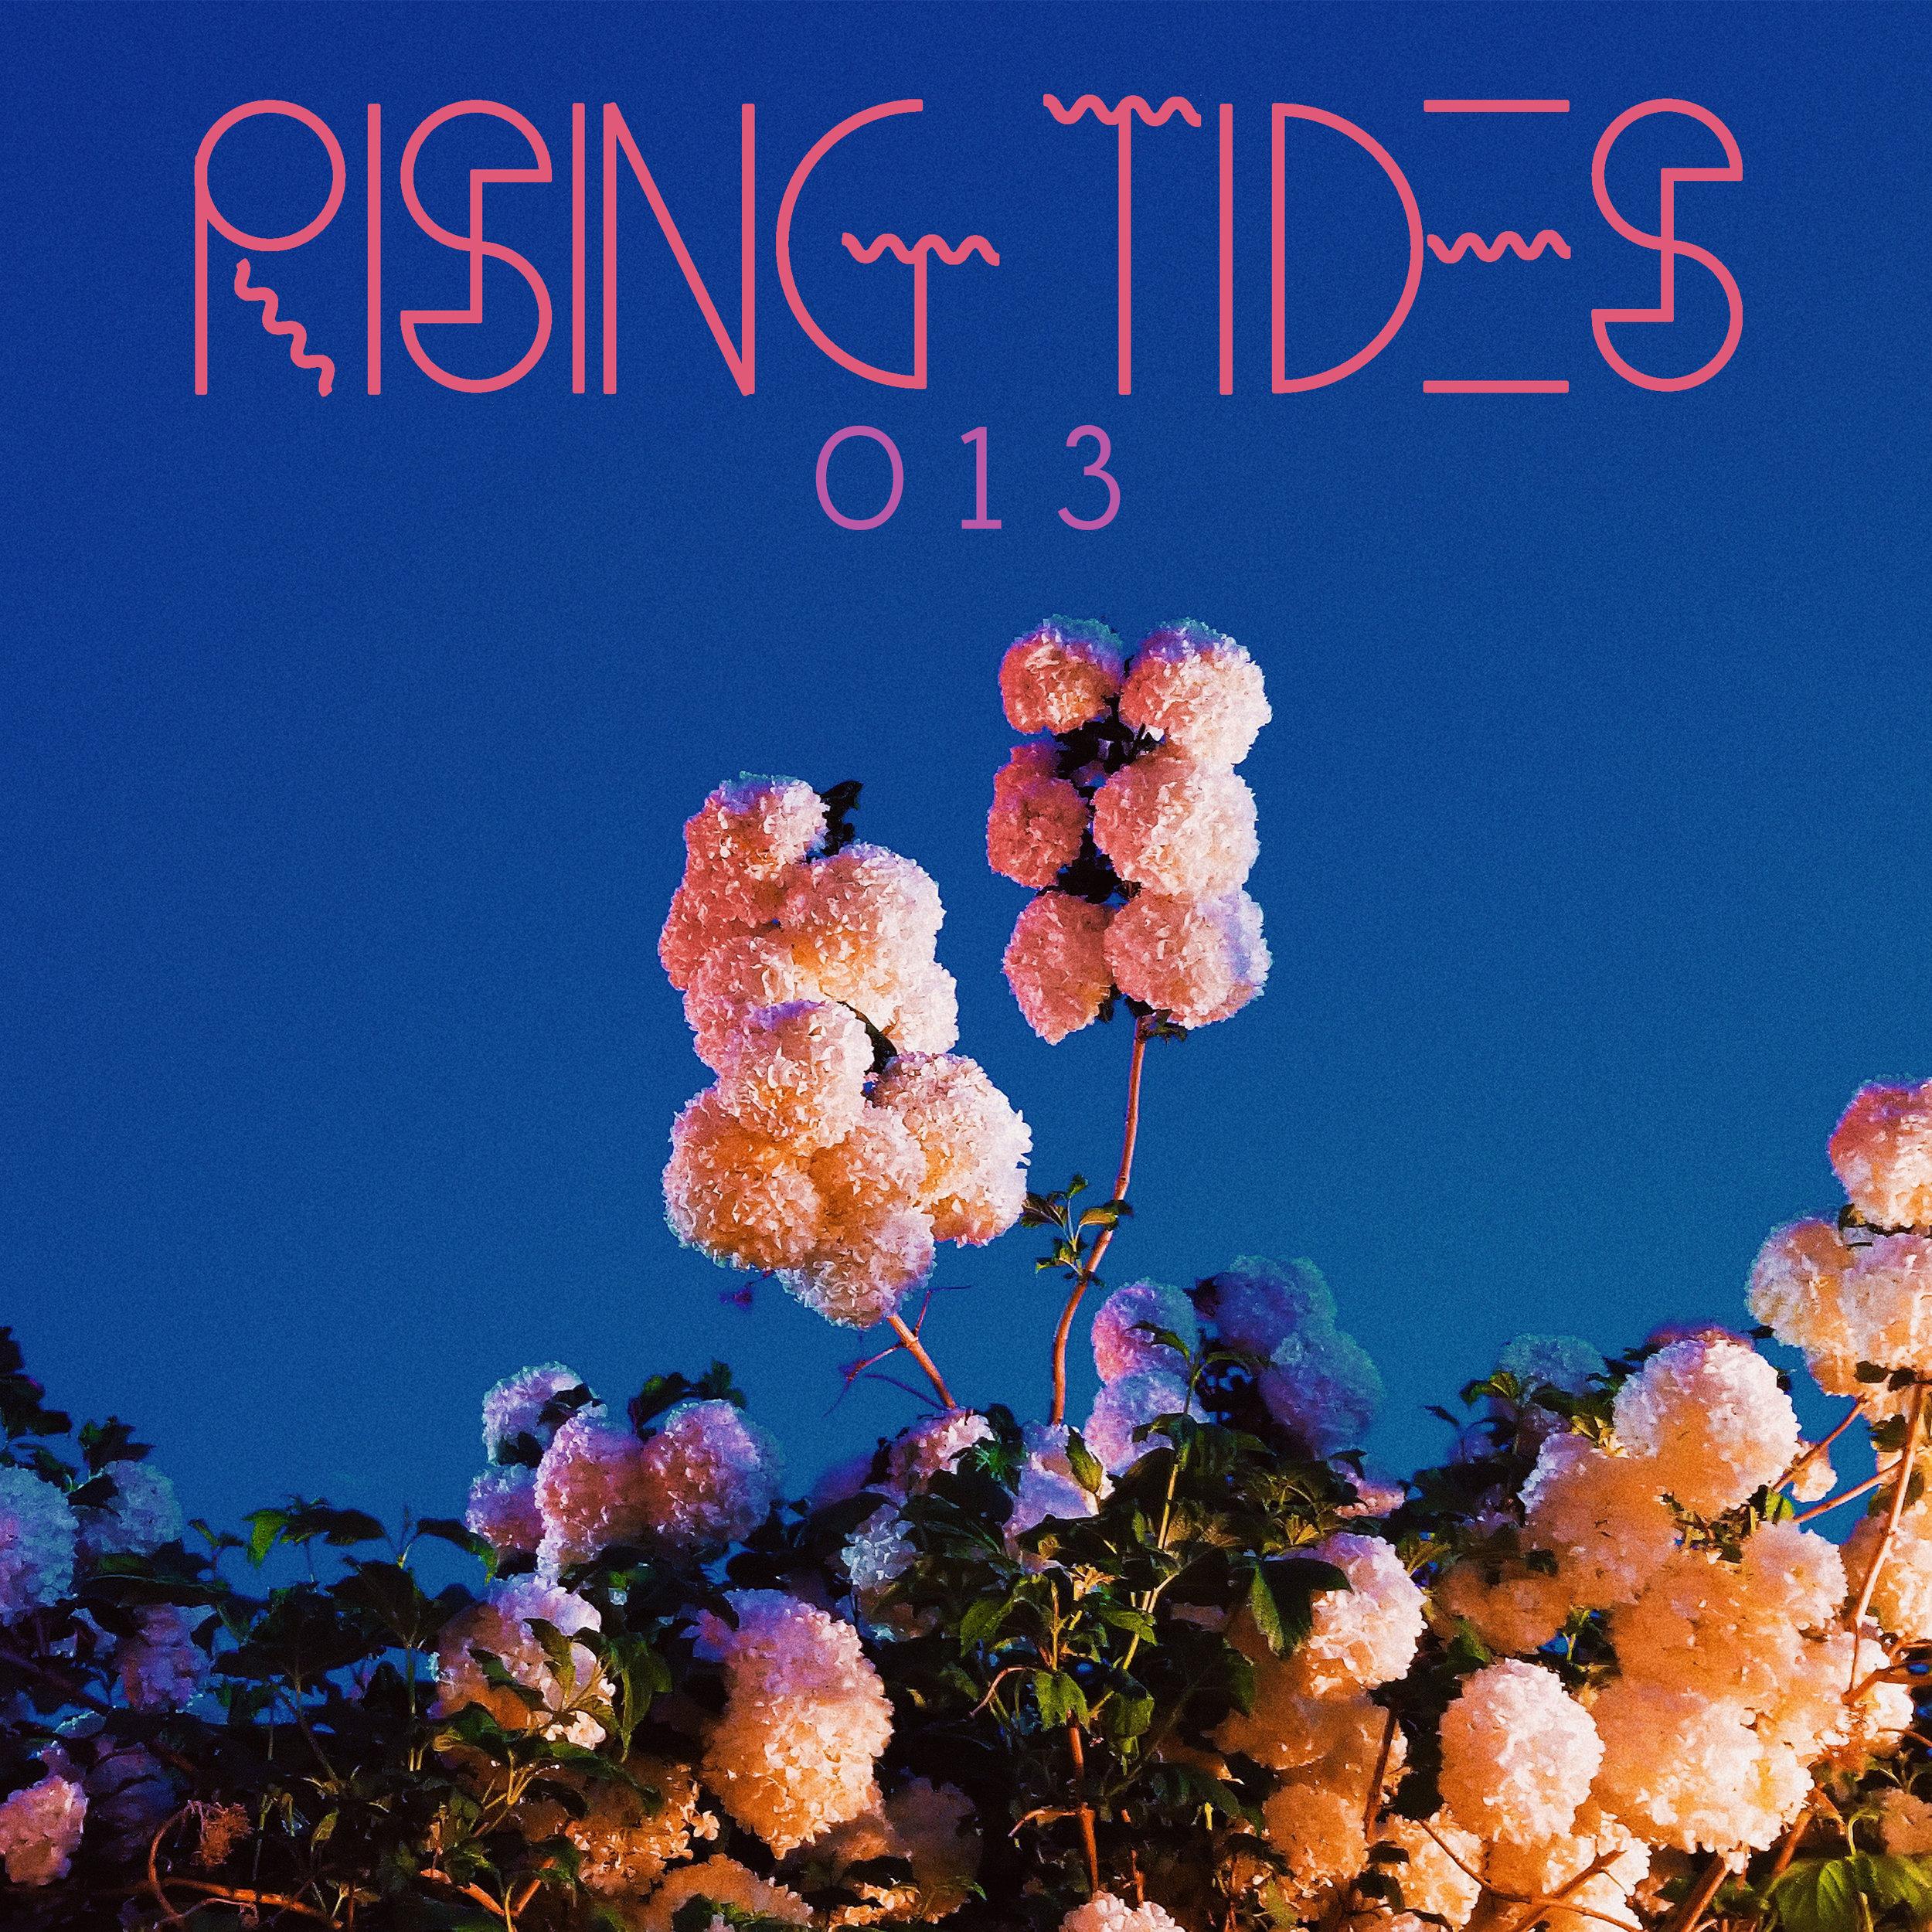 RISING TIDES 013.jpg